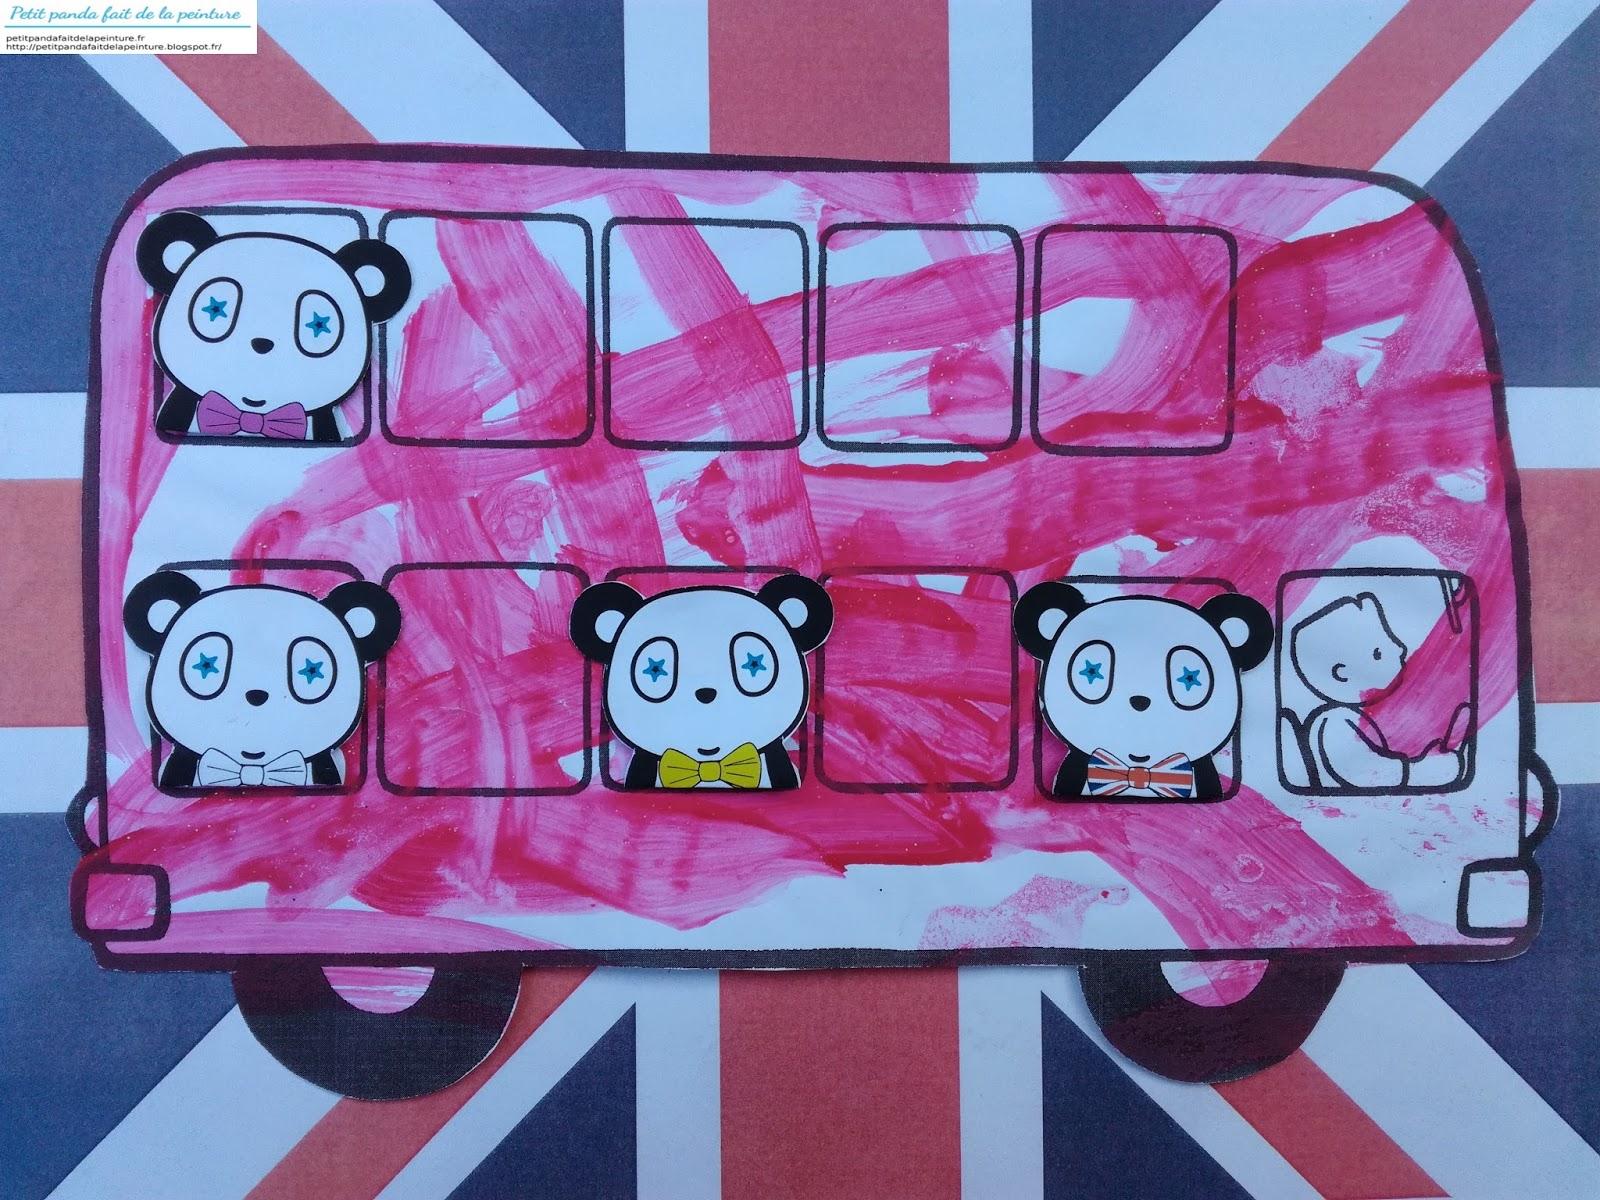 petit panda fait de la peinture theme angleterre bus. Black Bedroom Furniture Sets. Home Design Ideas